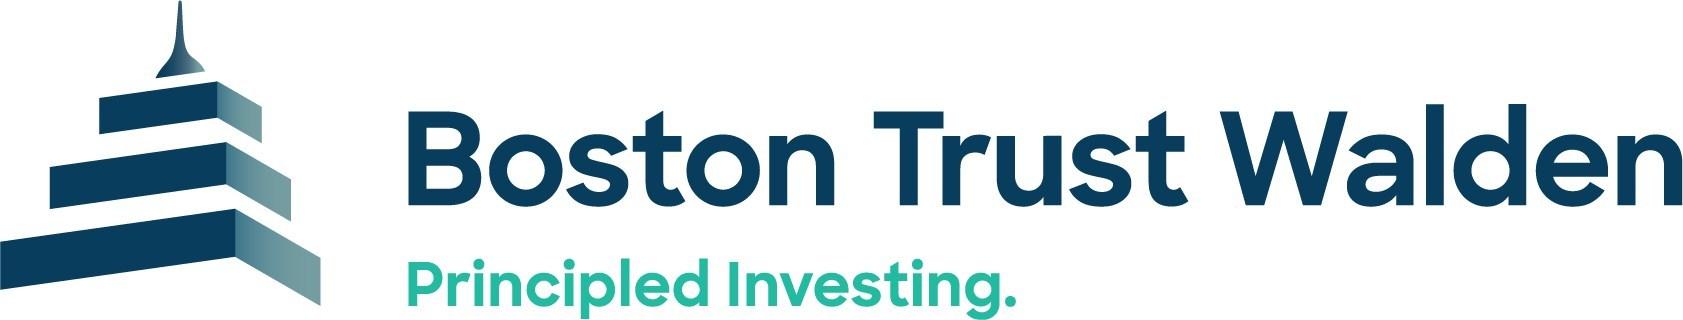 Boston Trust Walden logo